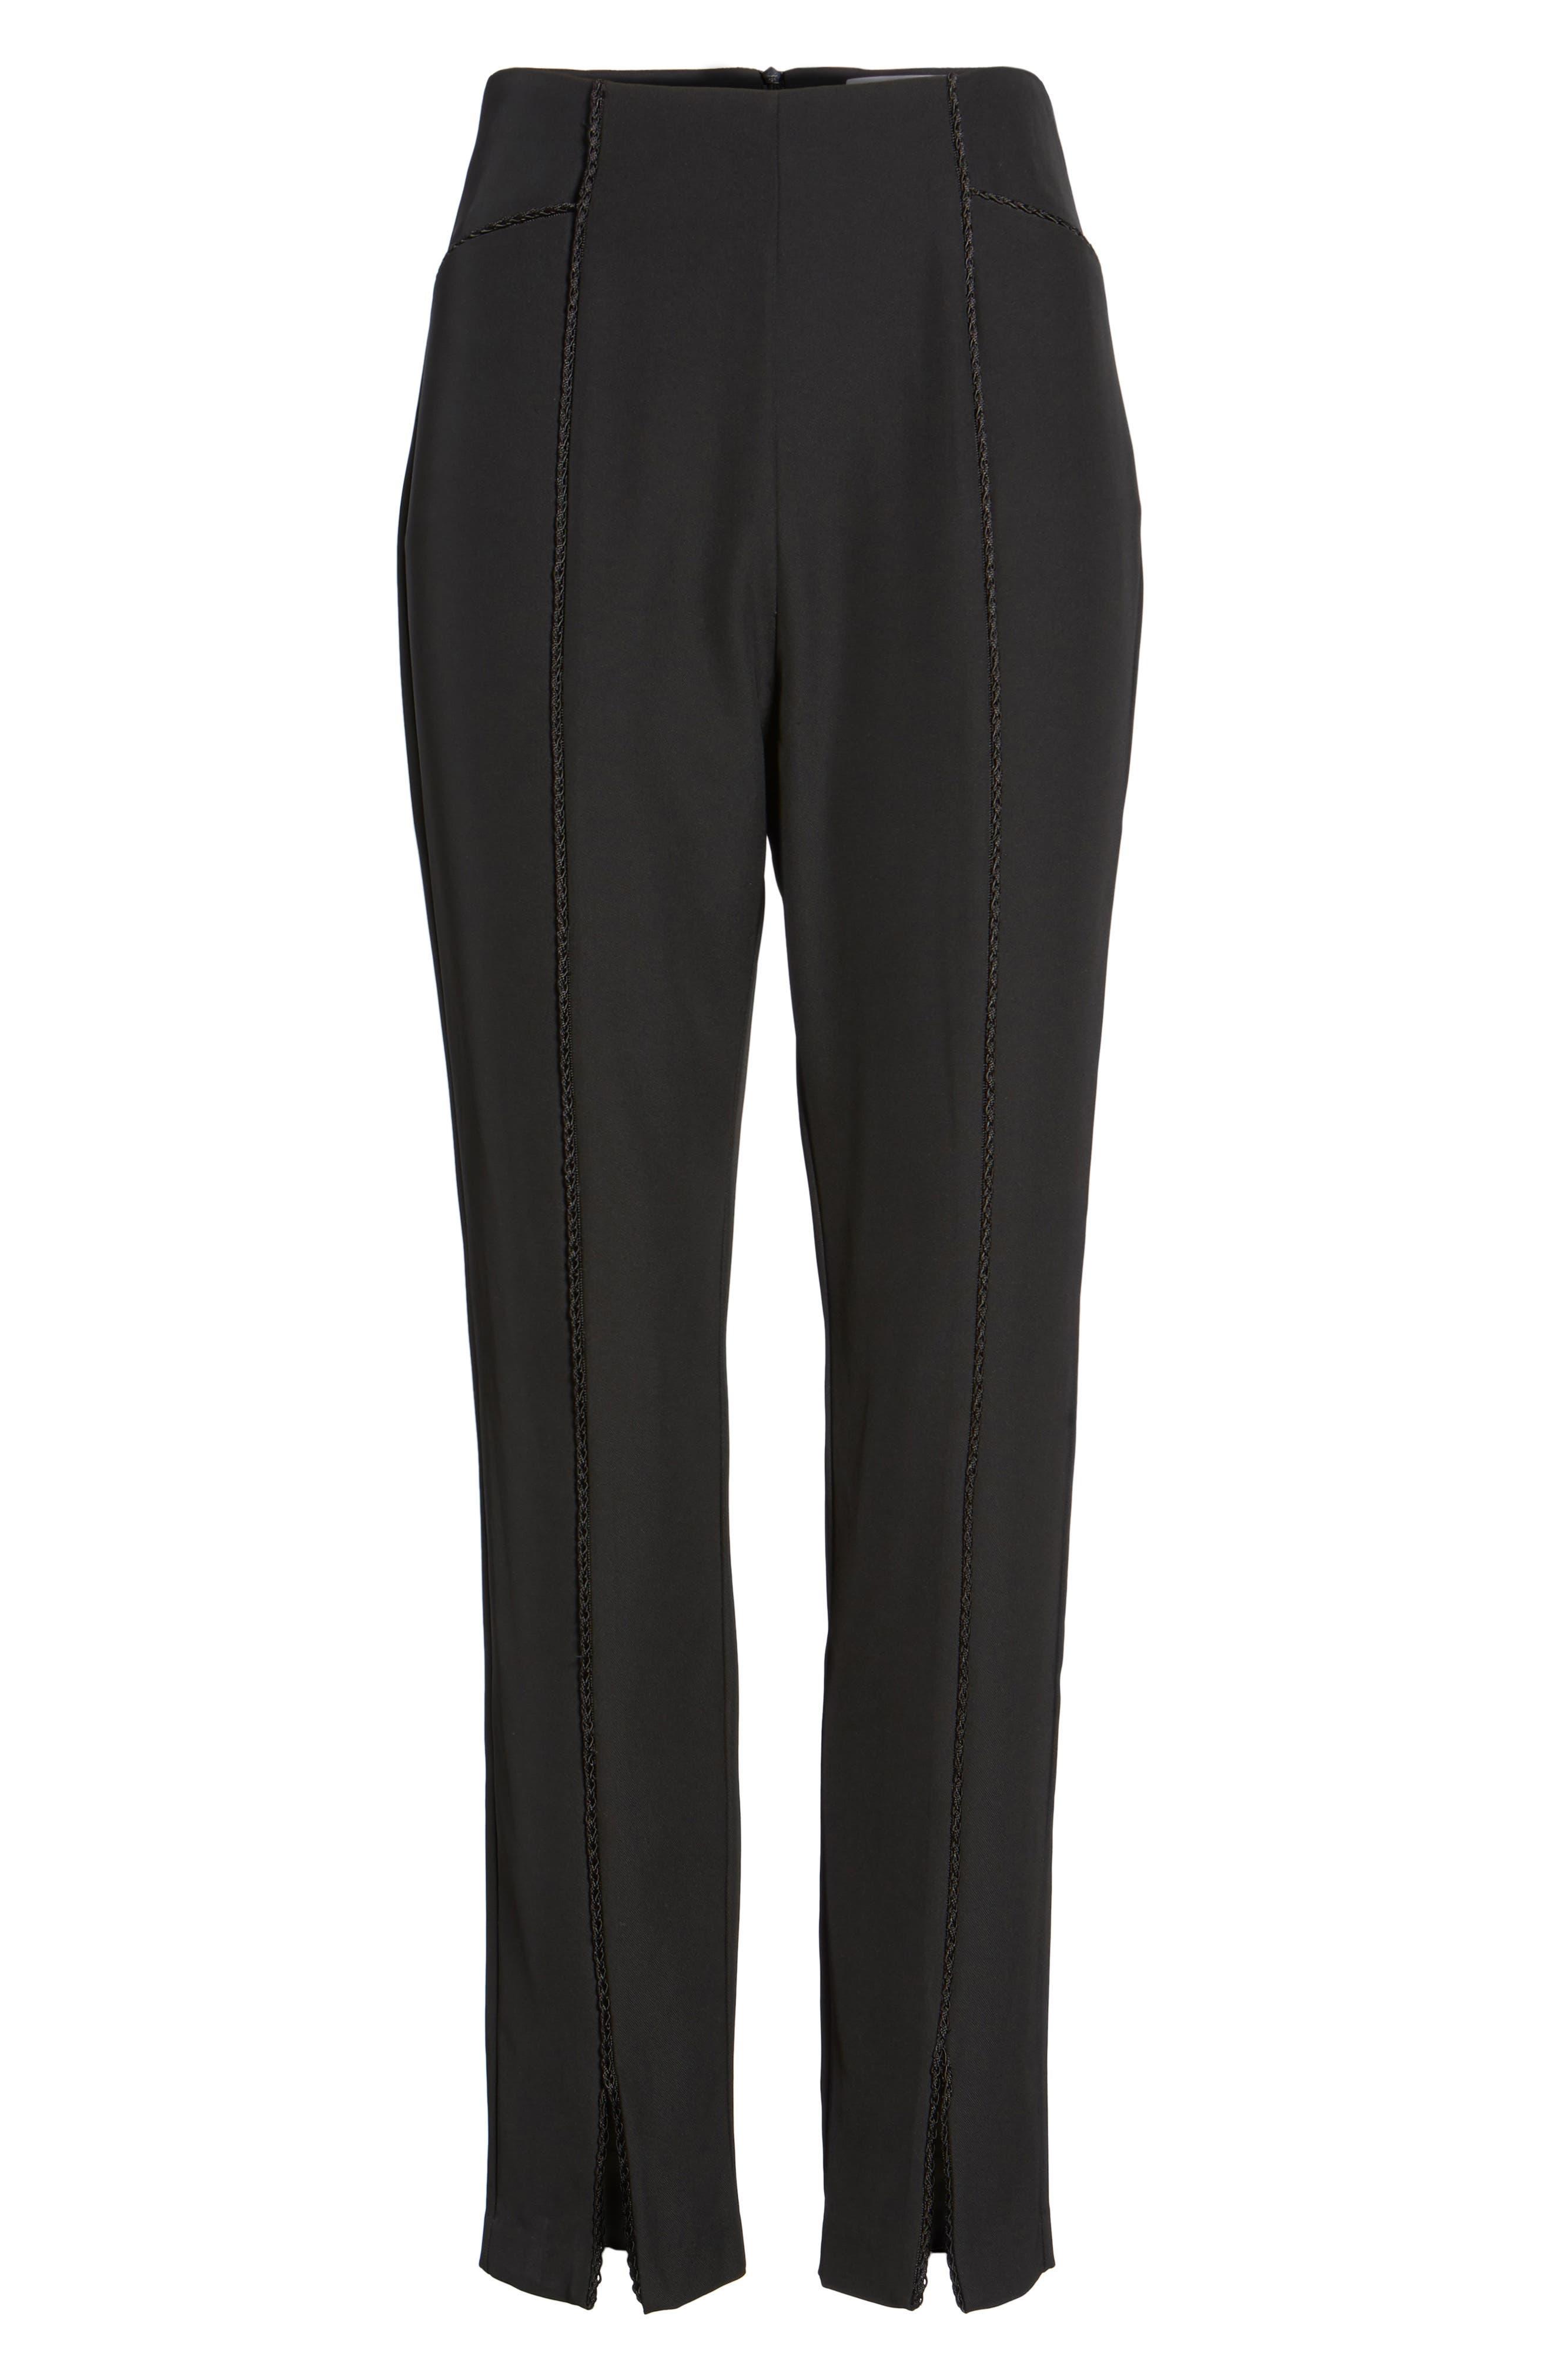 Ceremony Crop Trousers,                             Alternate thumbnail 6, color,                             Black